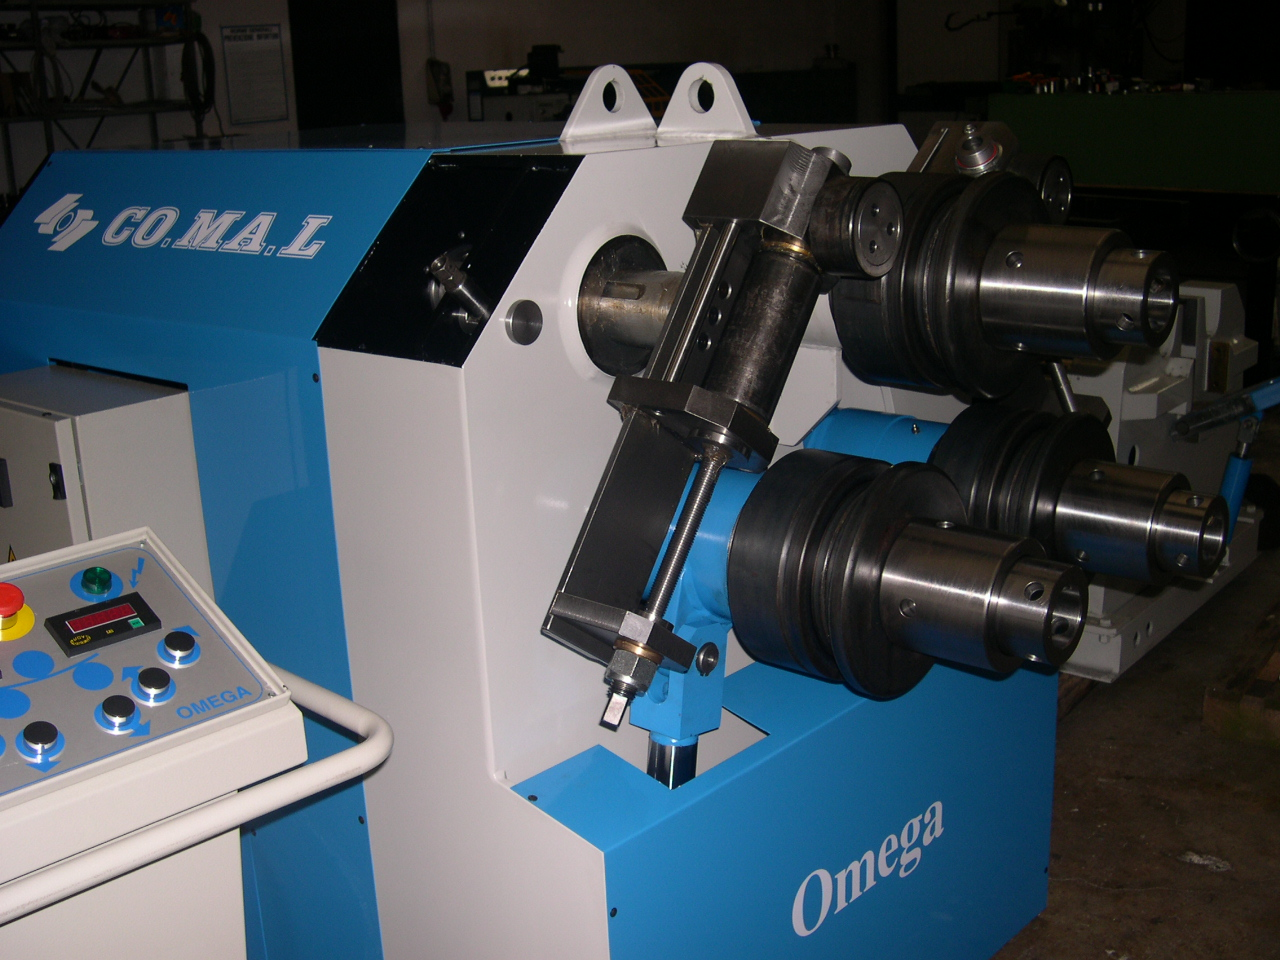 Omega80 Correction rolls